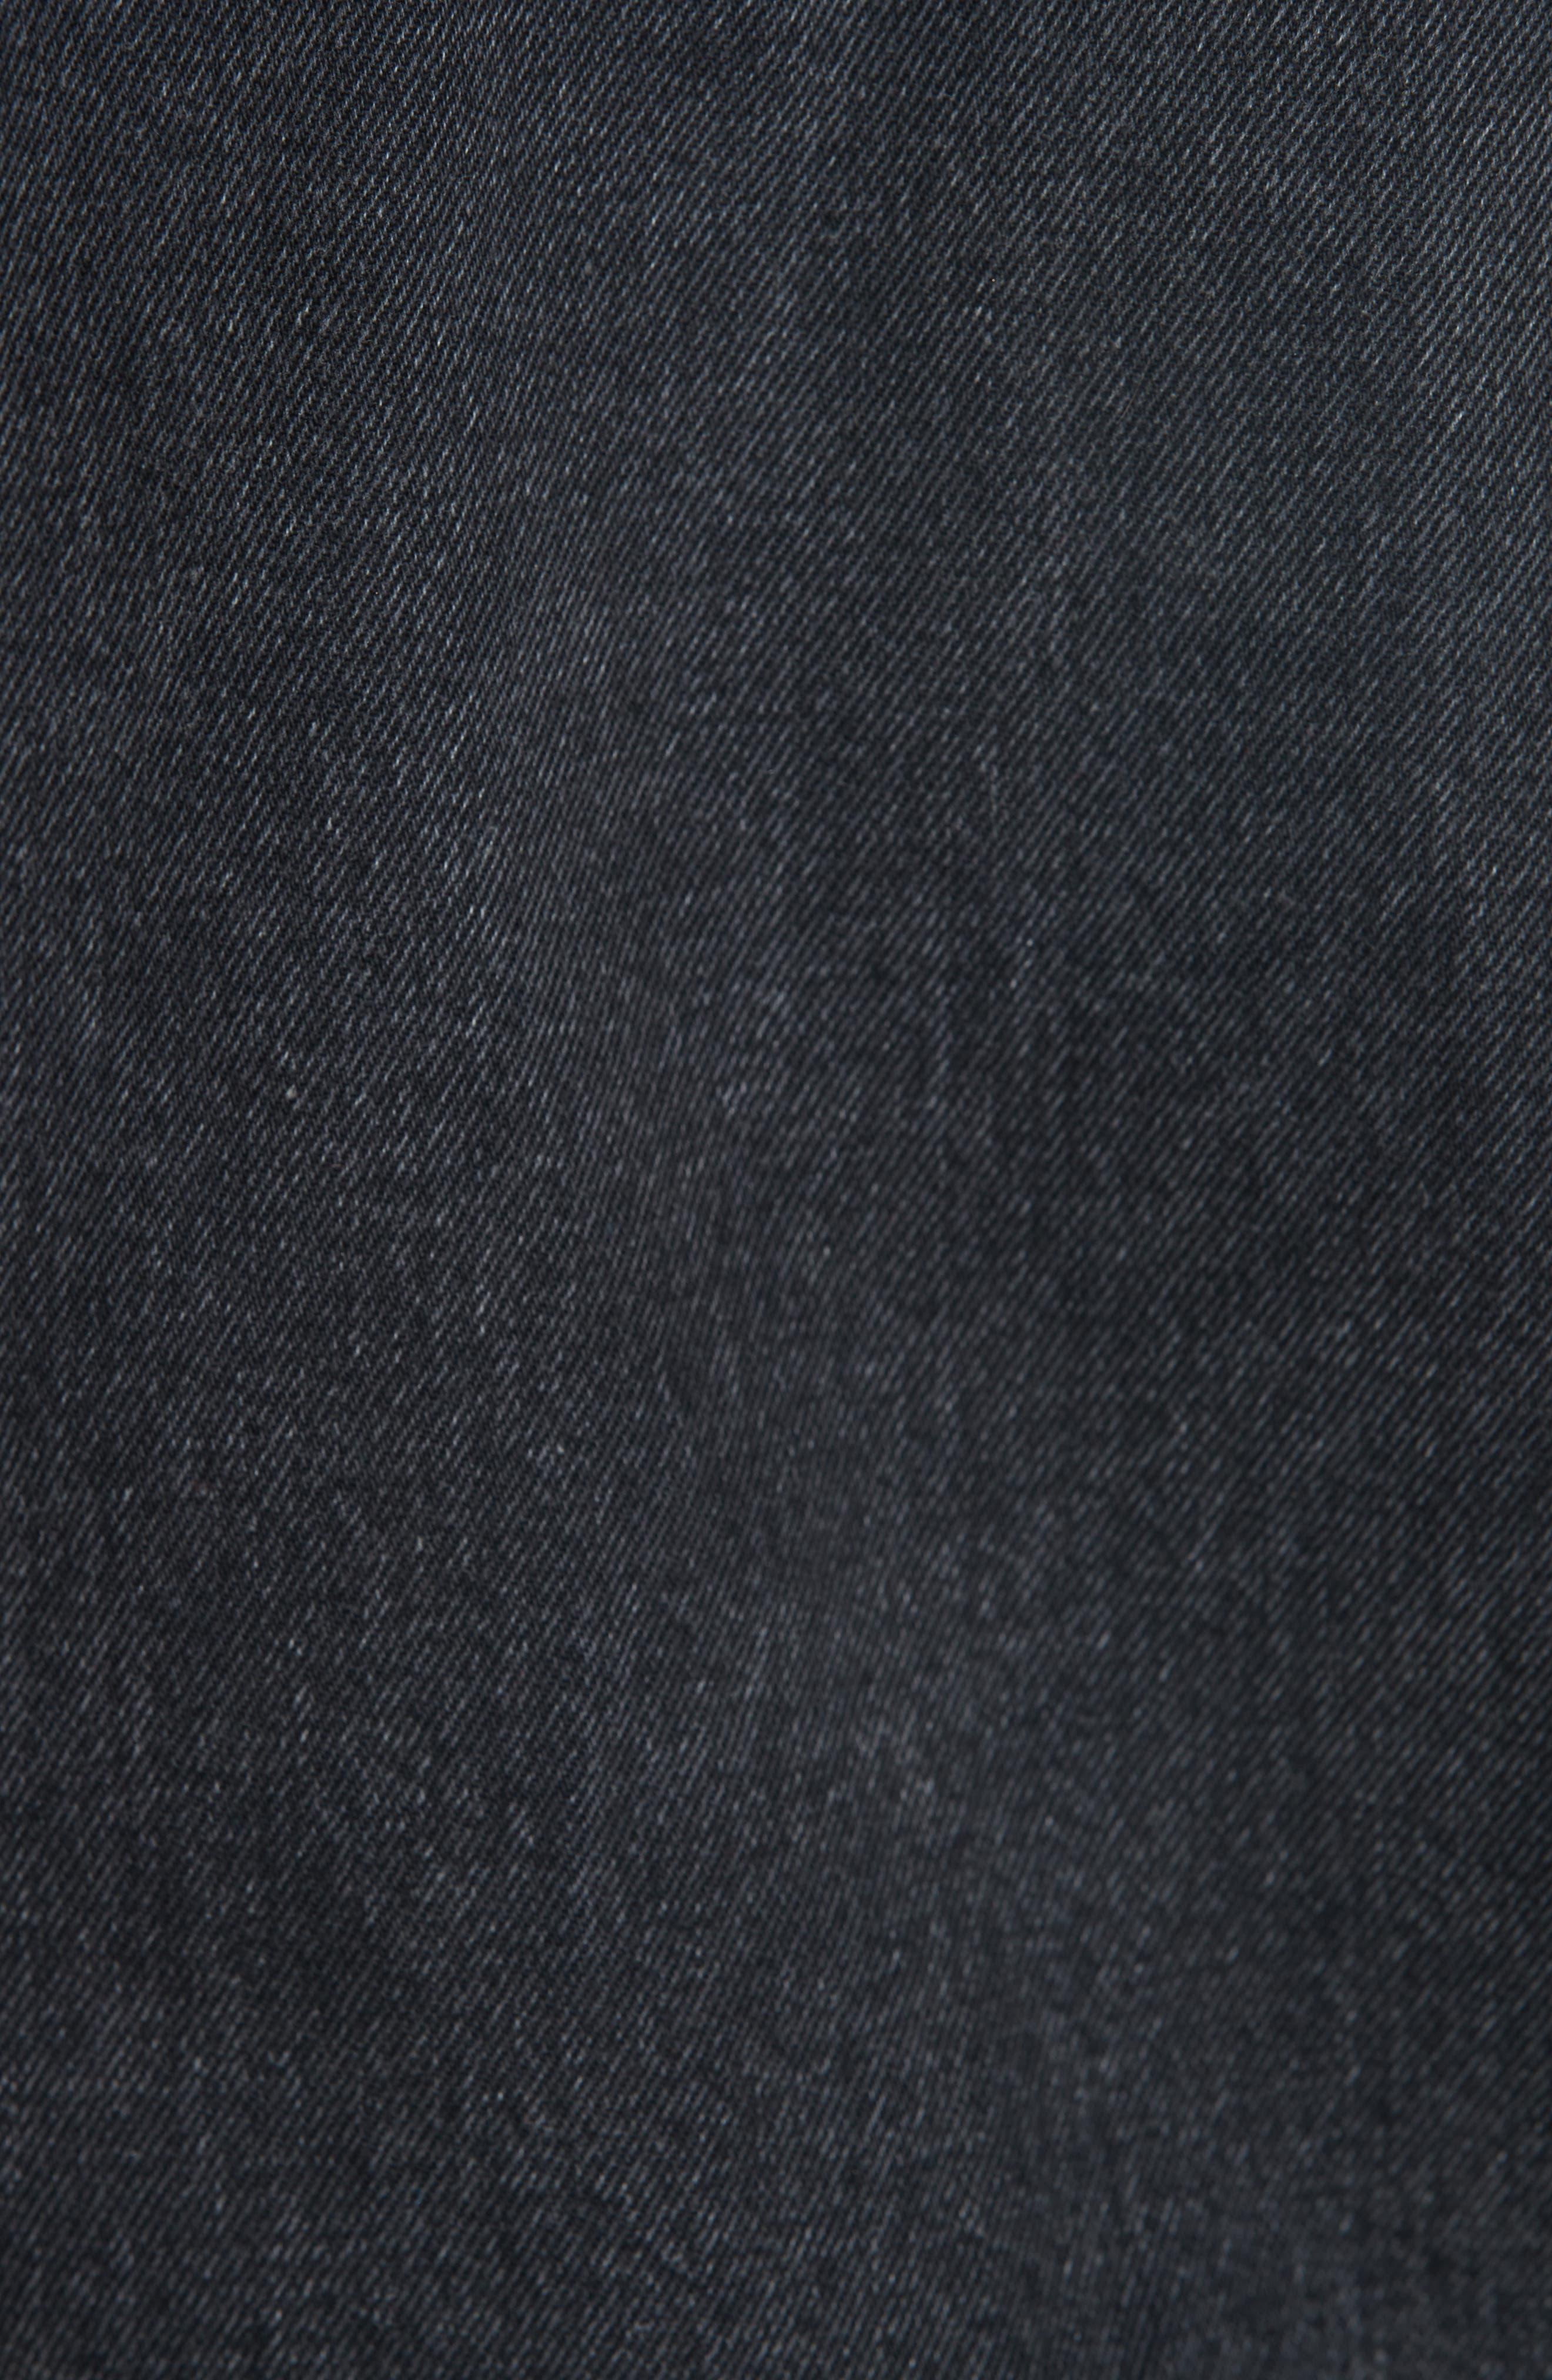 RAG & BONE,                             Nico Denim Jacket,                             Alternate thumbnail 7, color,                             001